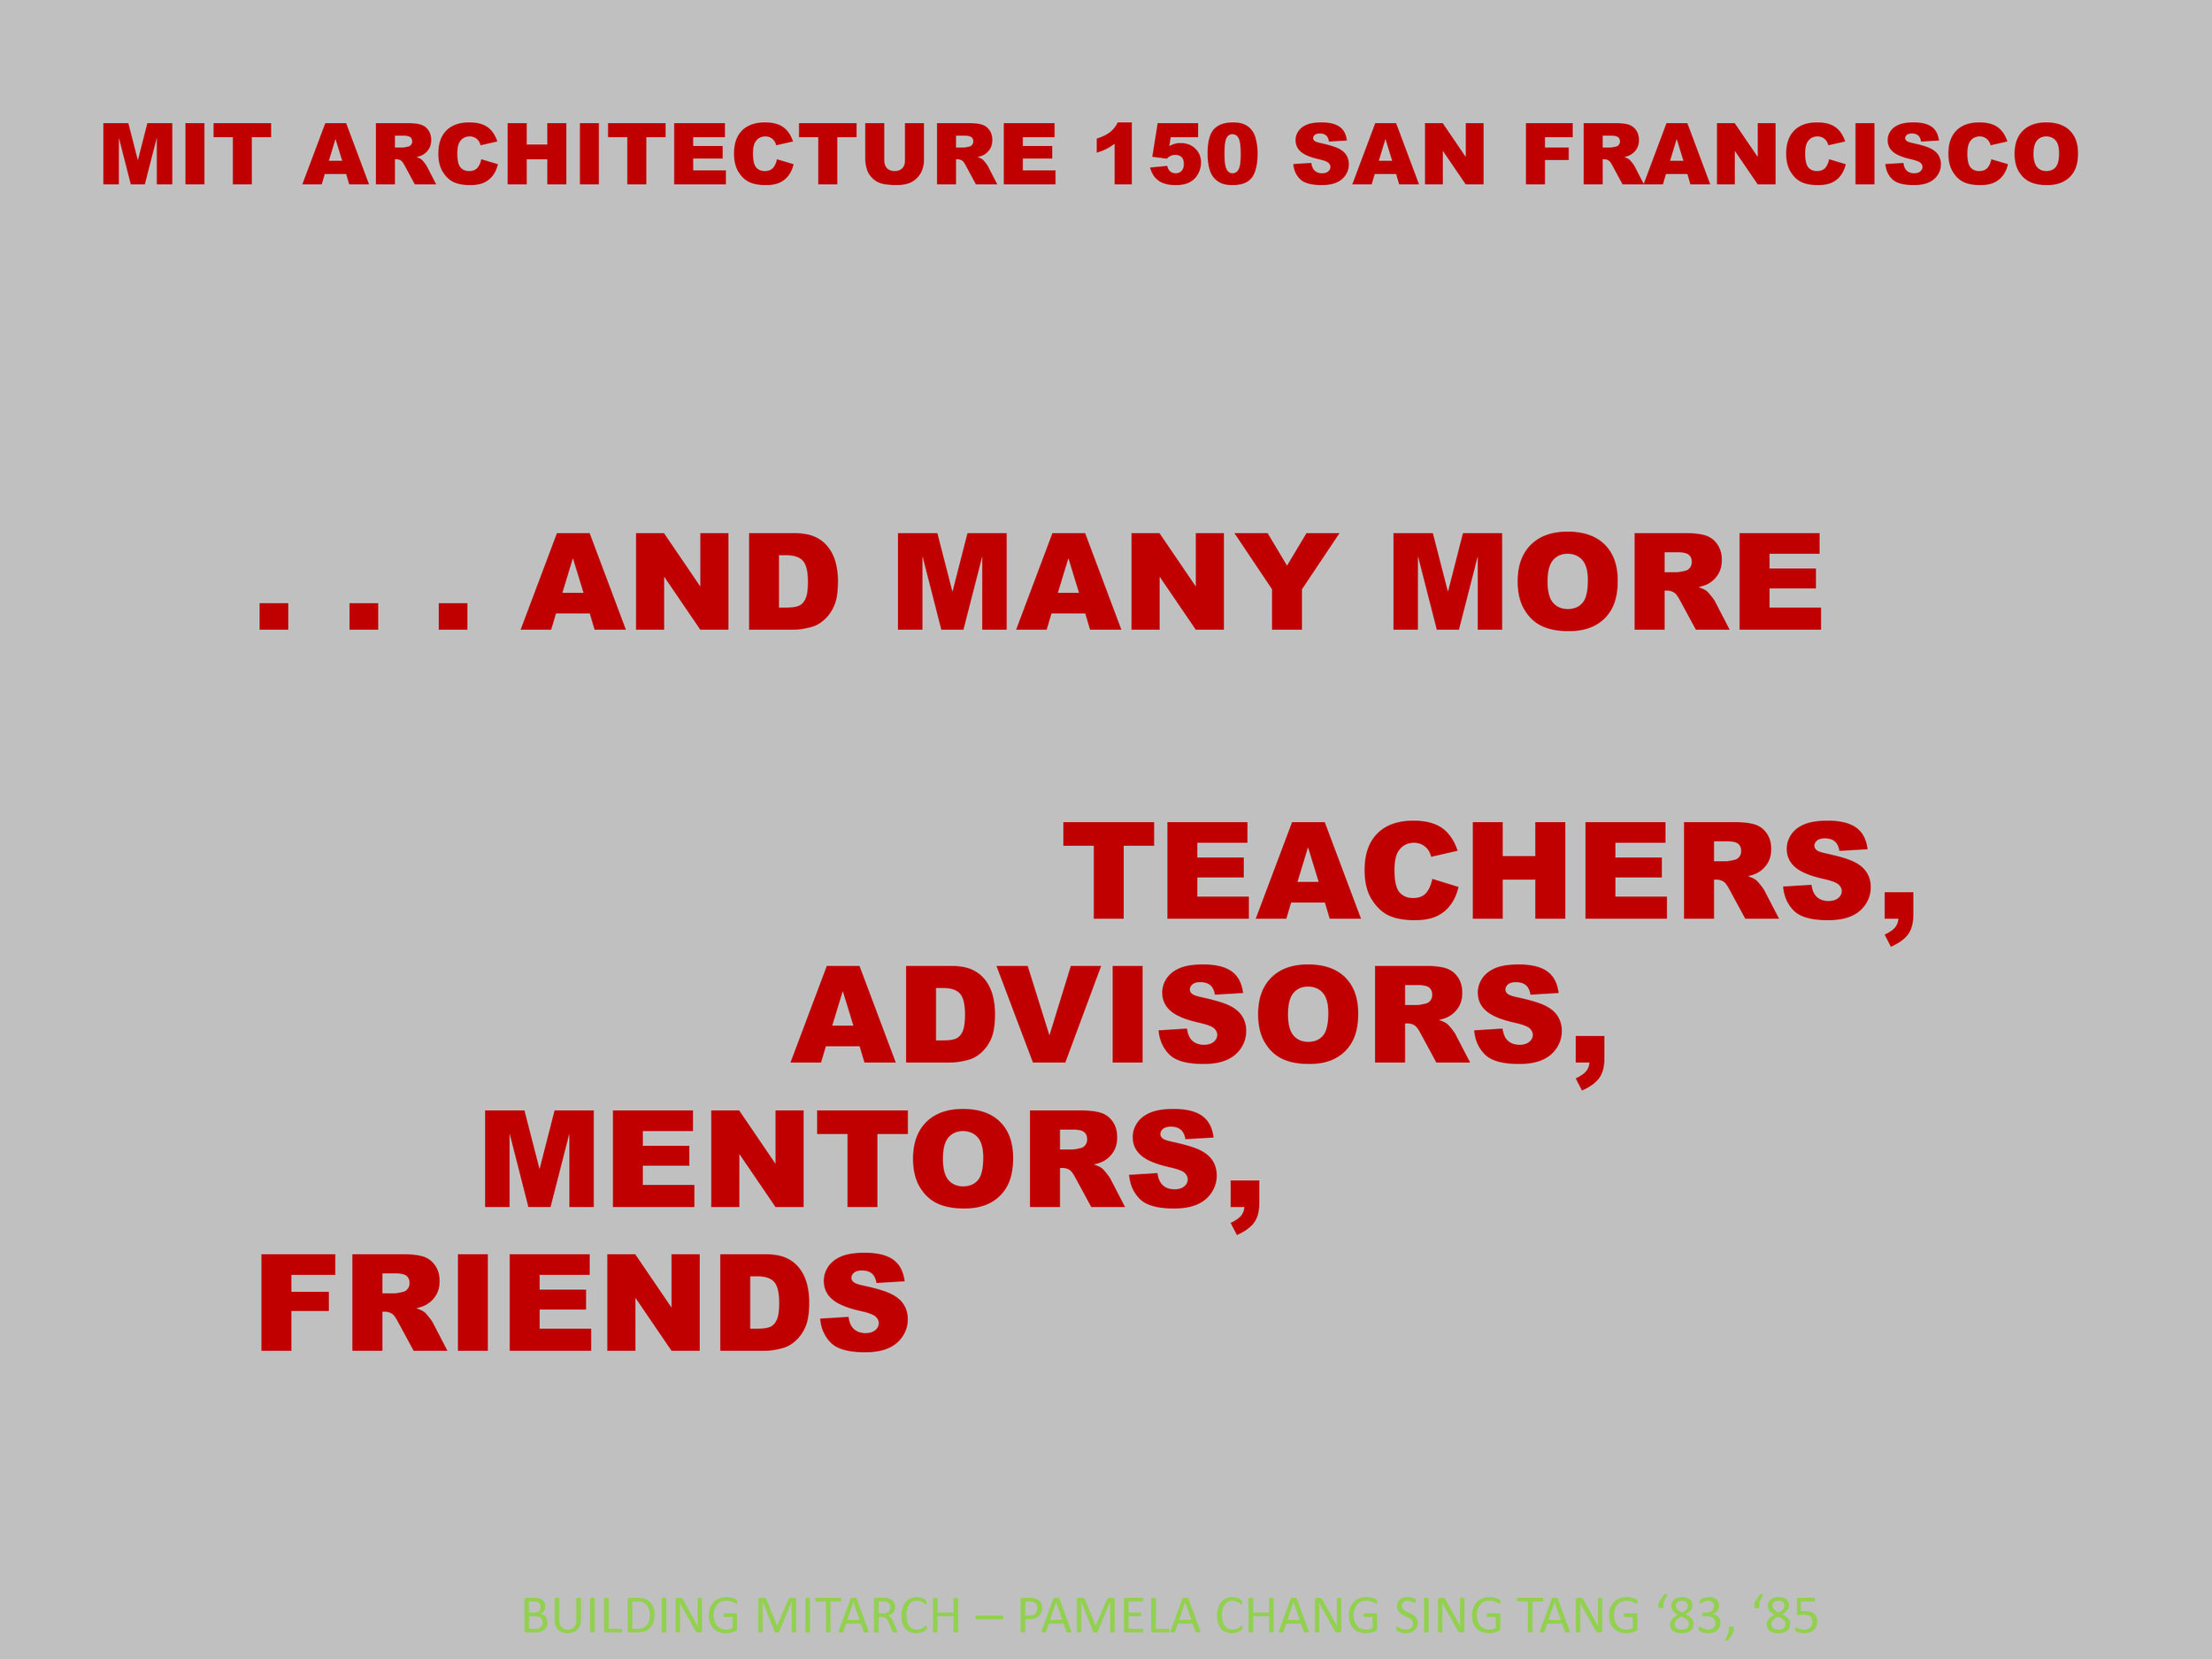 MIT ARCHITECTURE 150 SAN FRANCISCO SLIDESHOW-54 copy.jpg